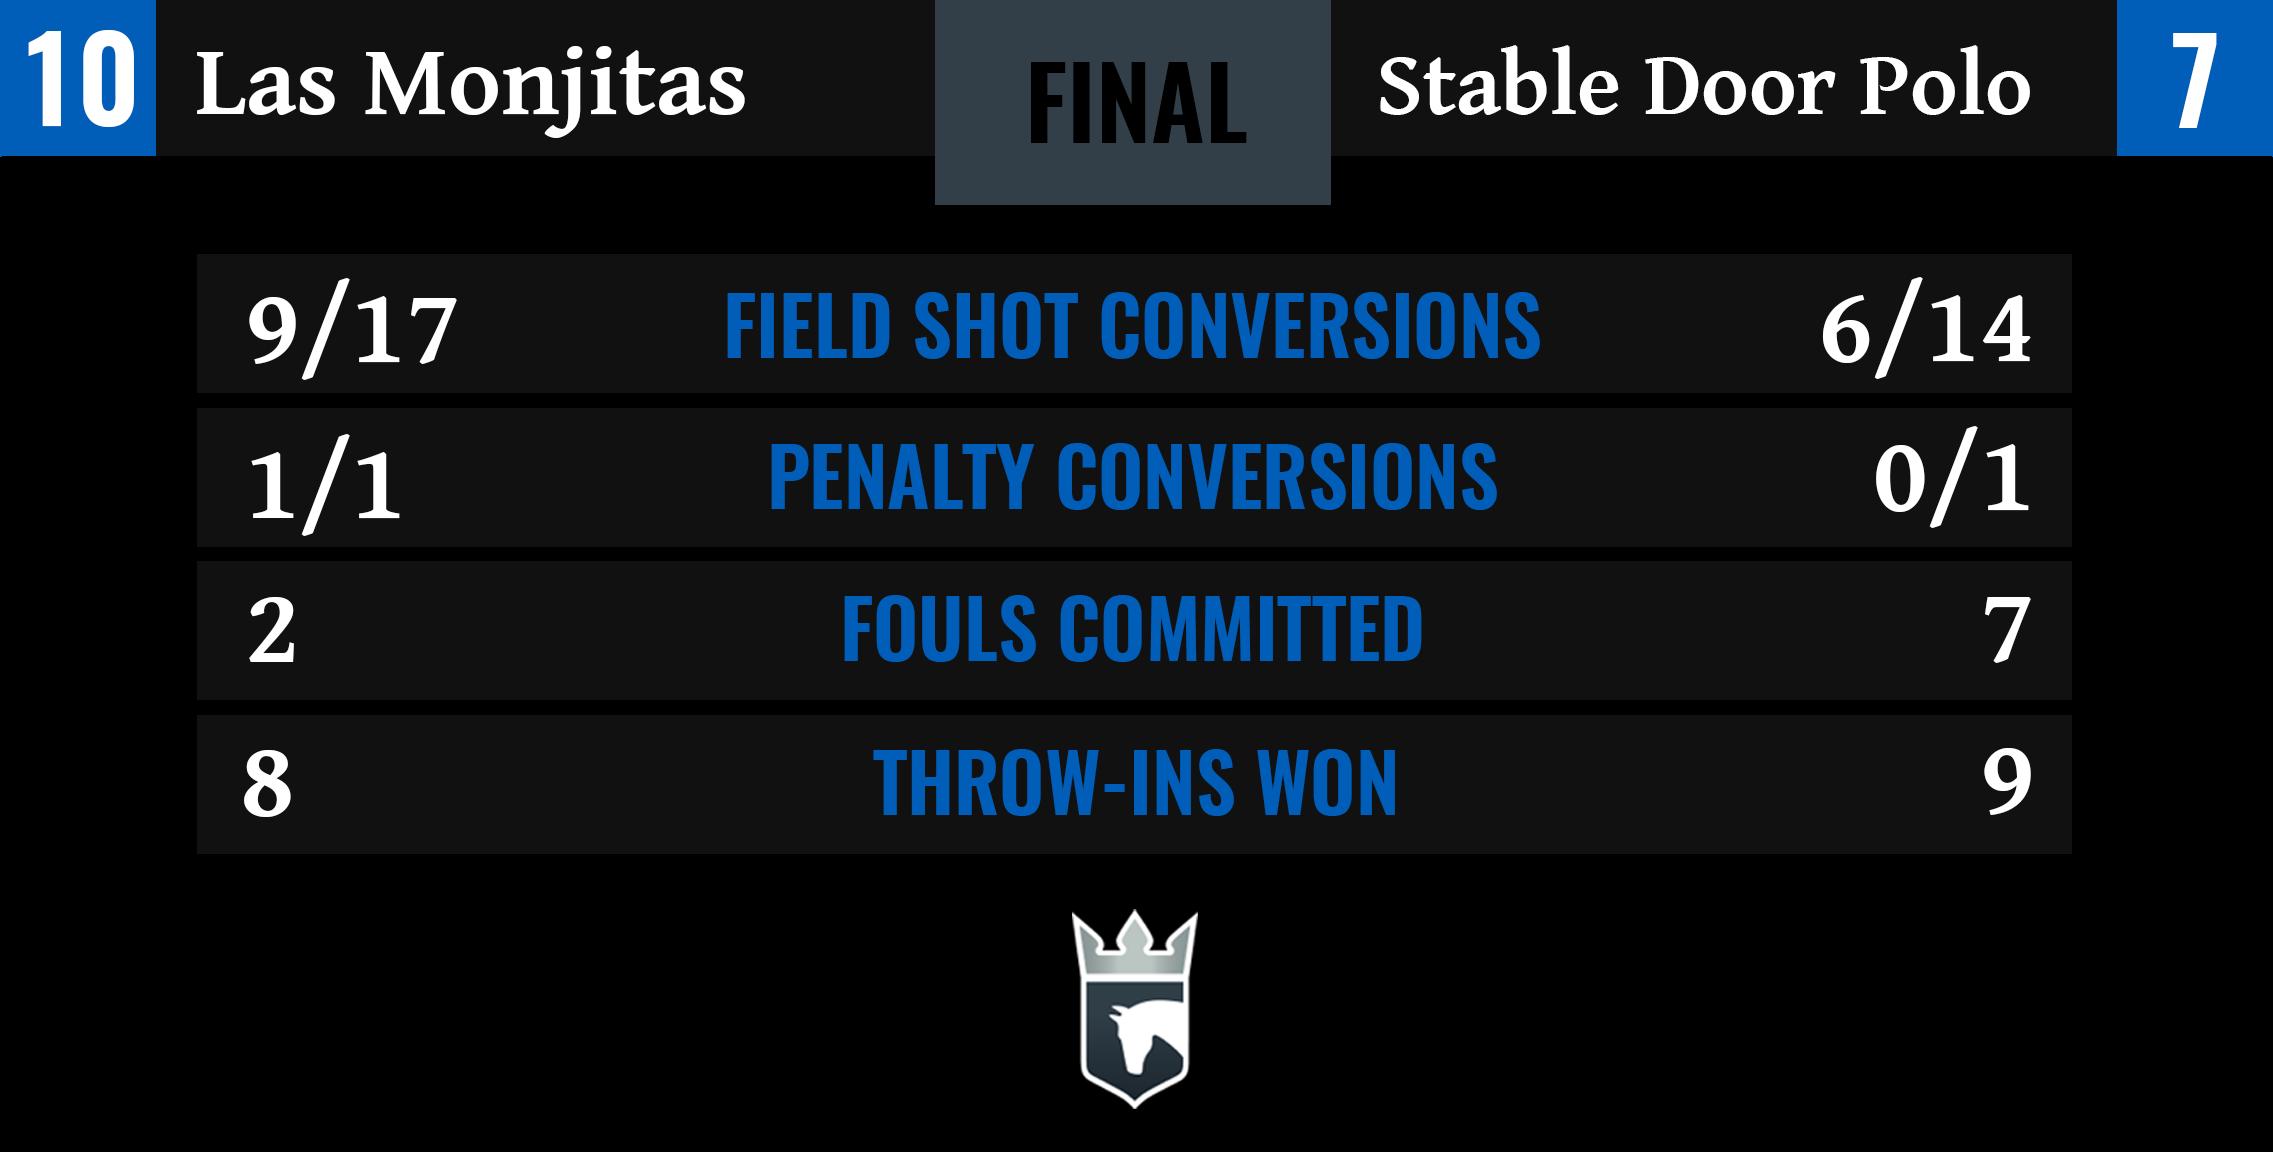 Las Monjitas vs Stable Door Polo Final Stats